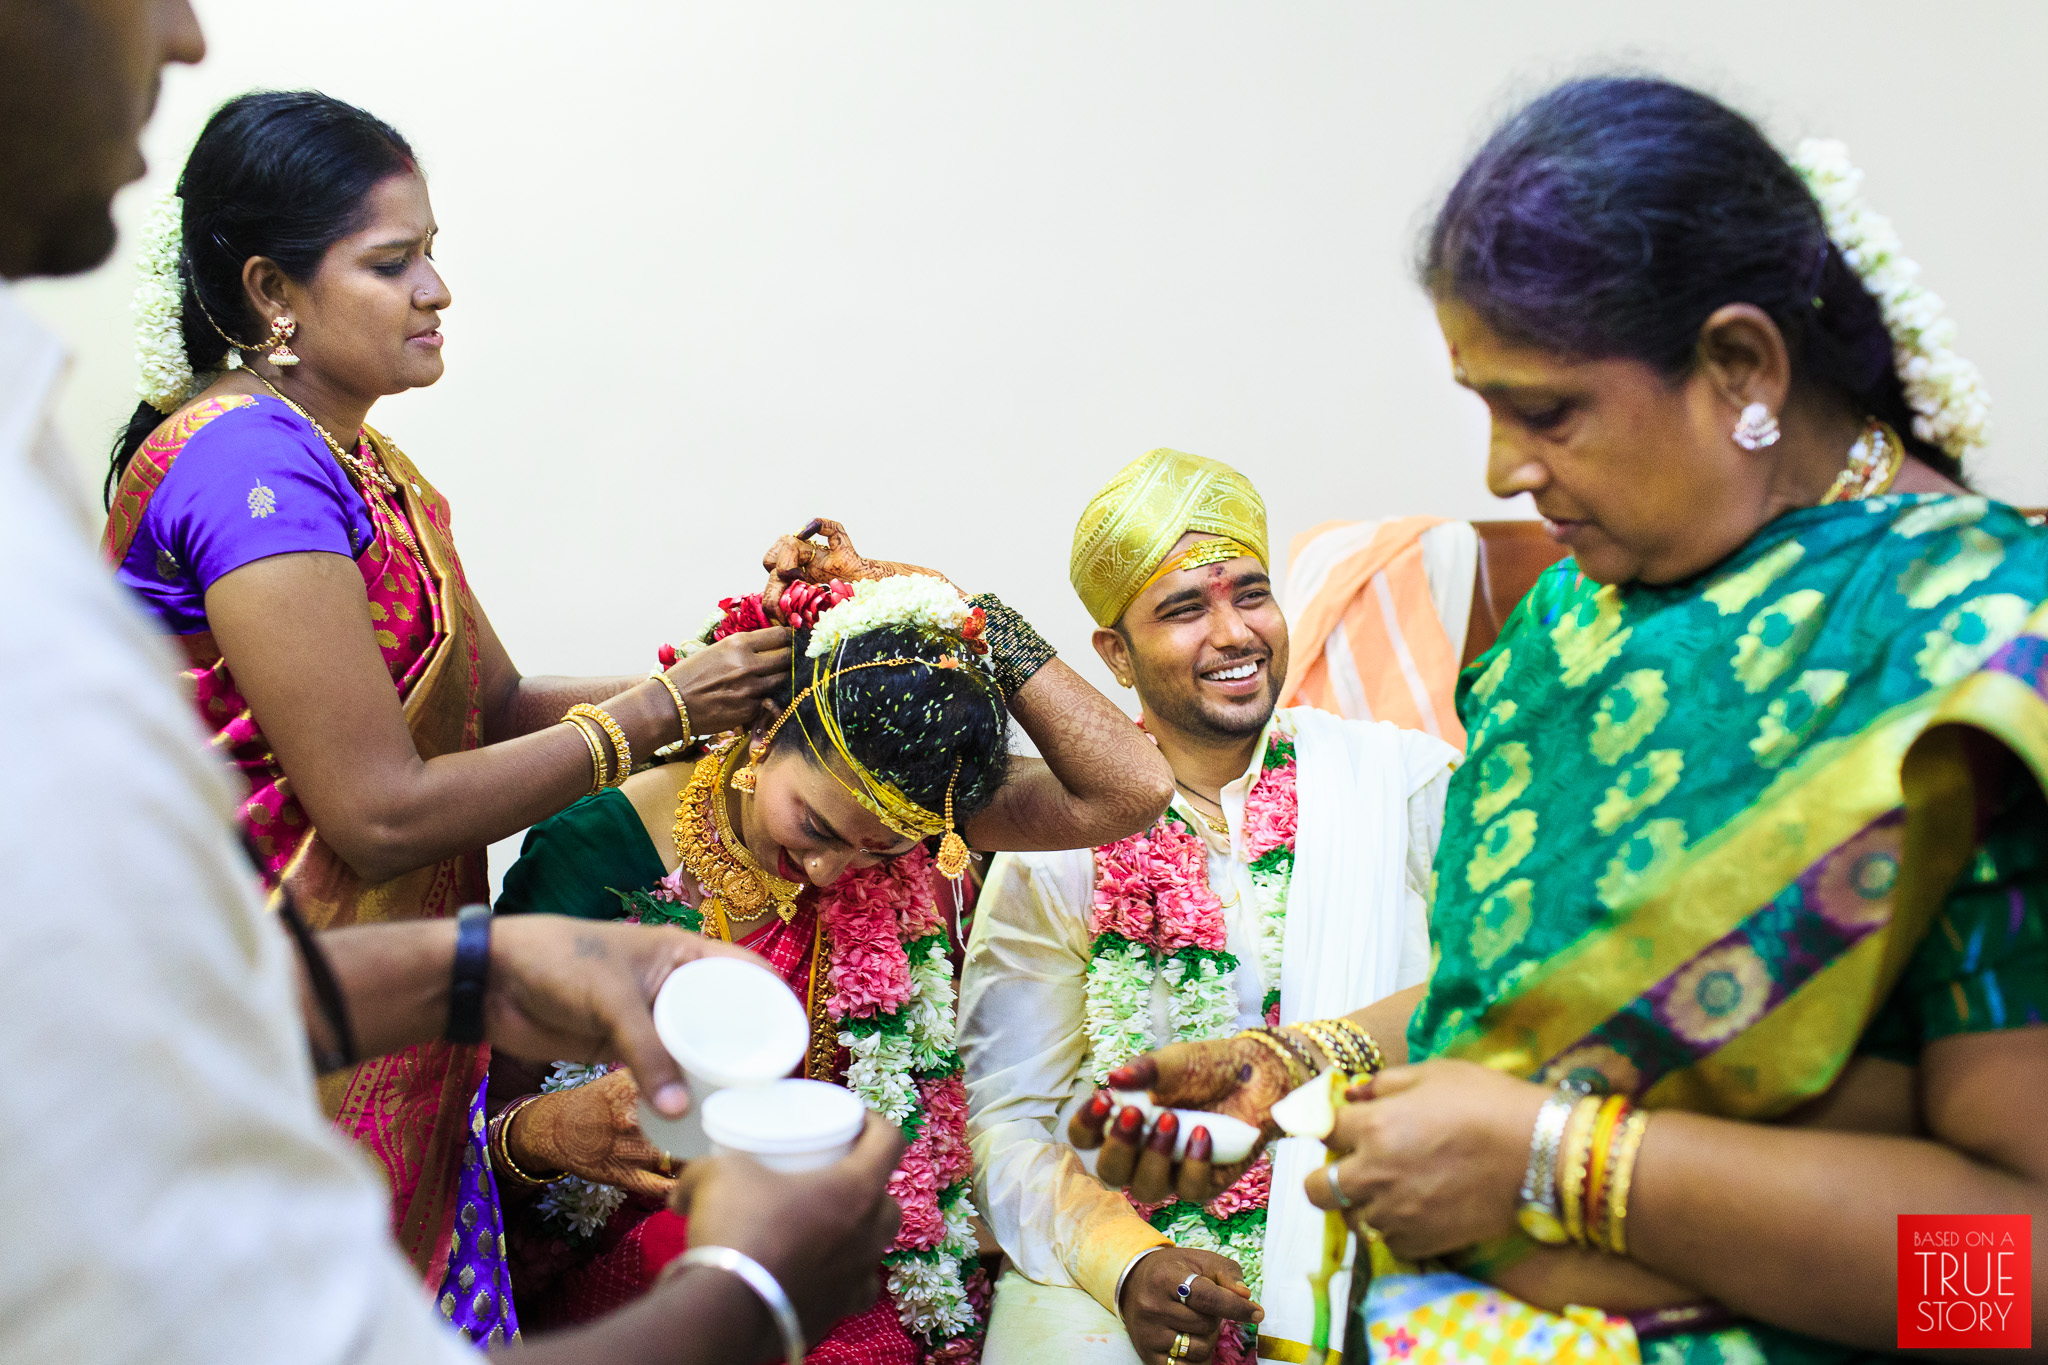 Tamil-Candid-Wedding-Photography-0101.jpg